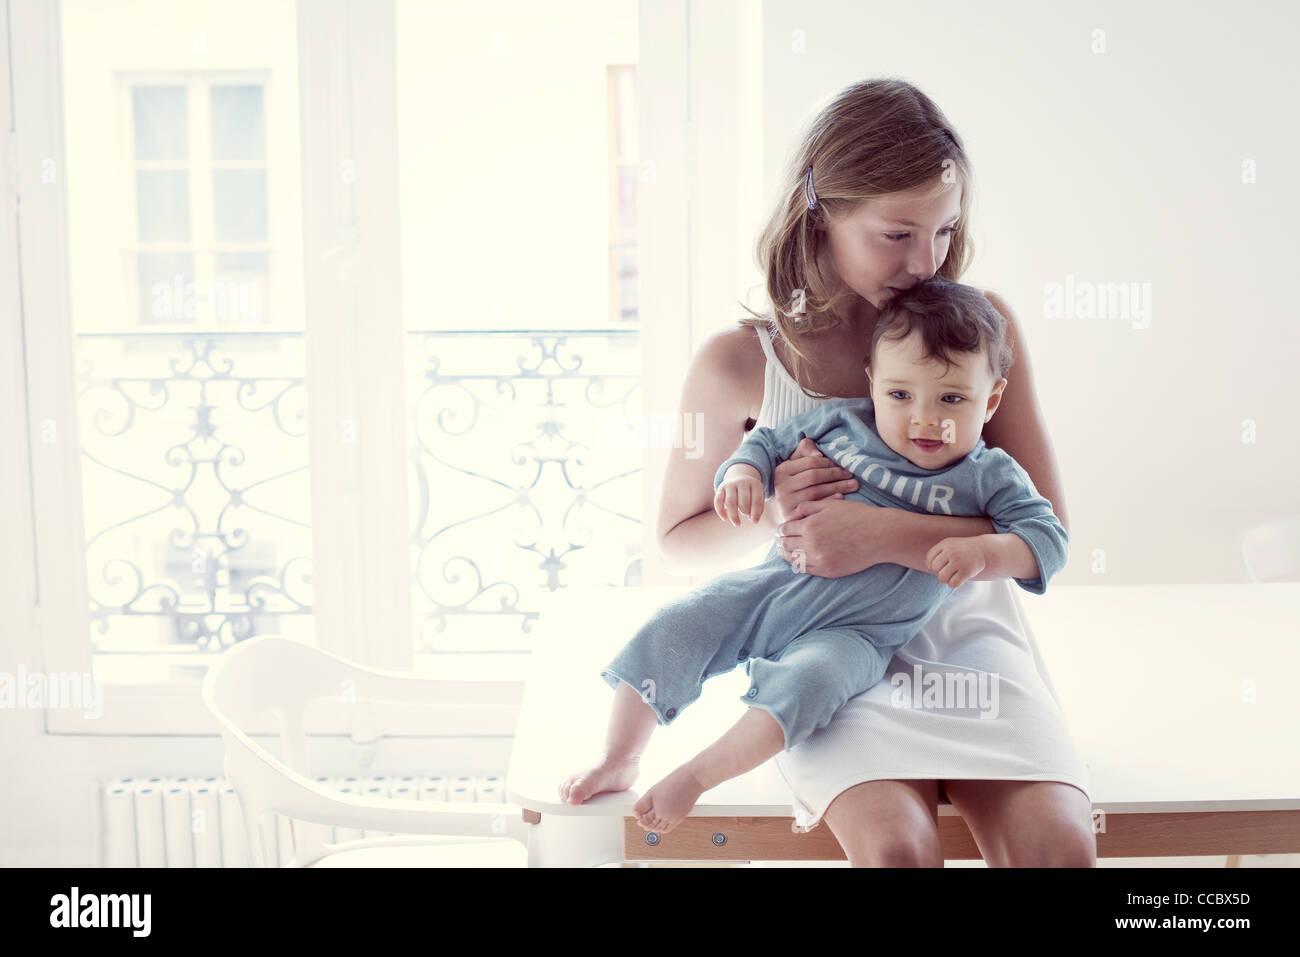 Girl kissing baby sister on lap, portrait - Stock Image